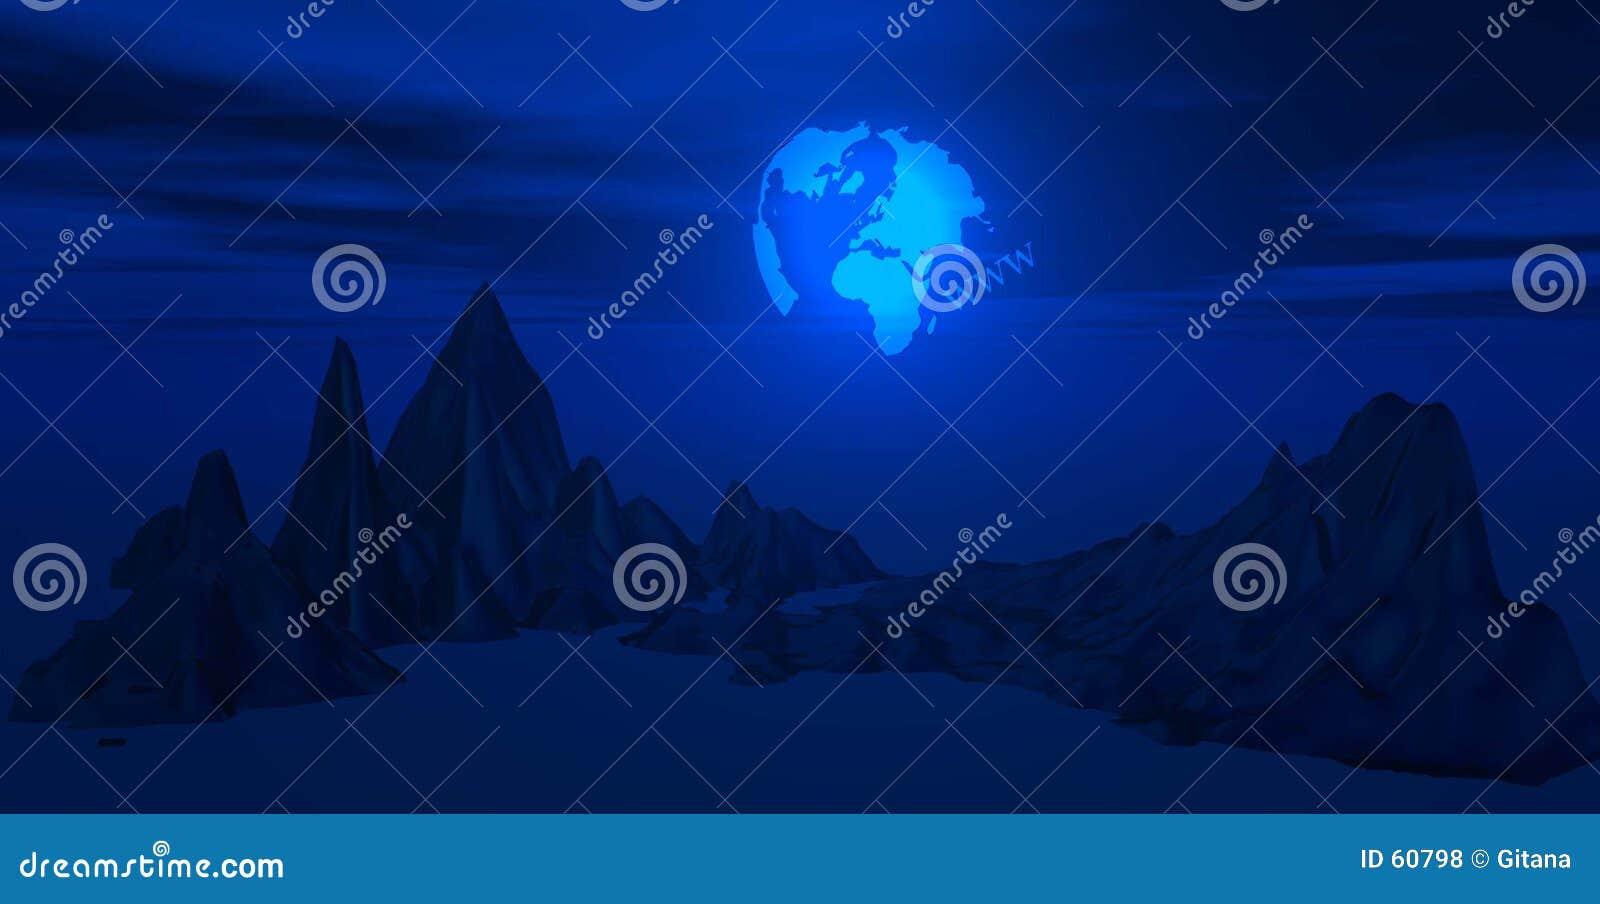 World ilustration